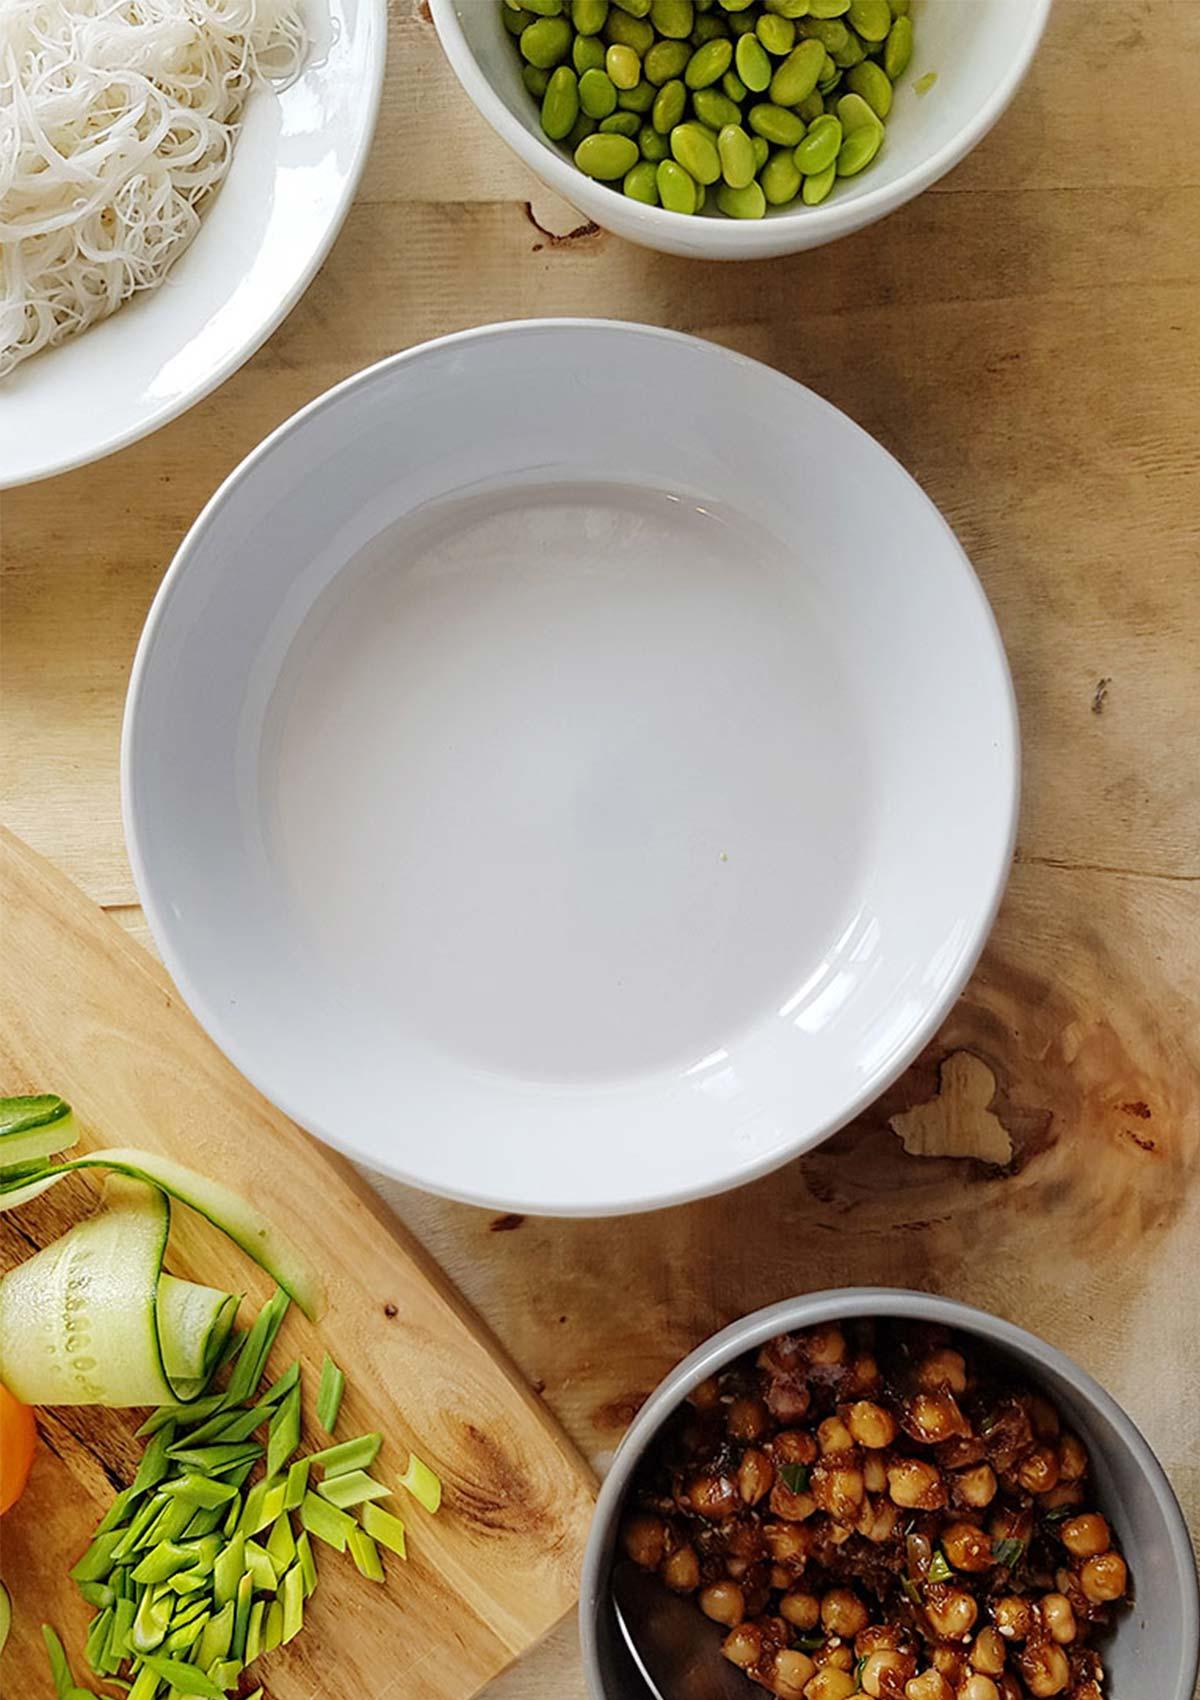 How to Assemble Vegan Poke Bowl